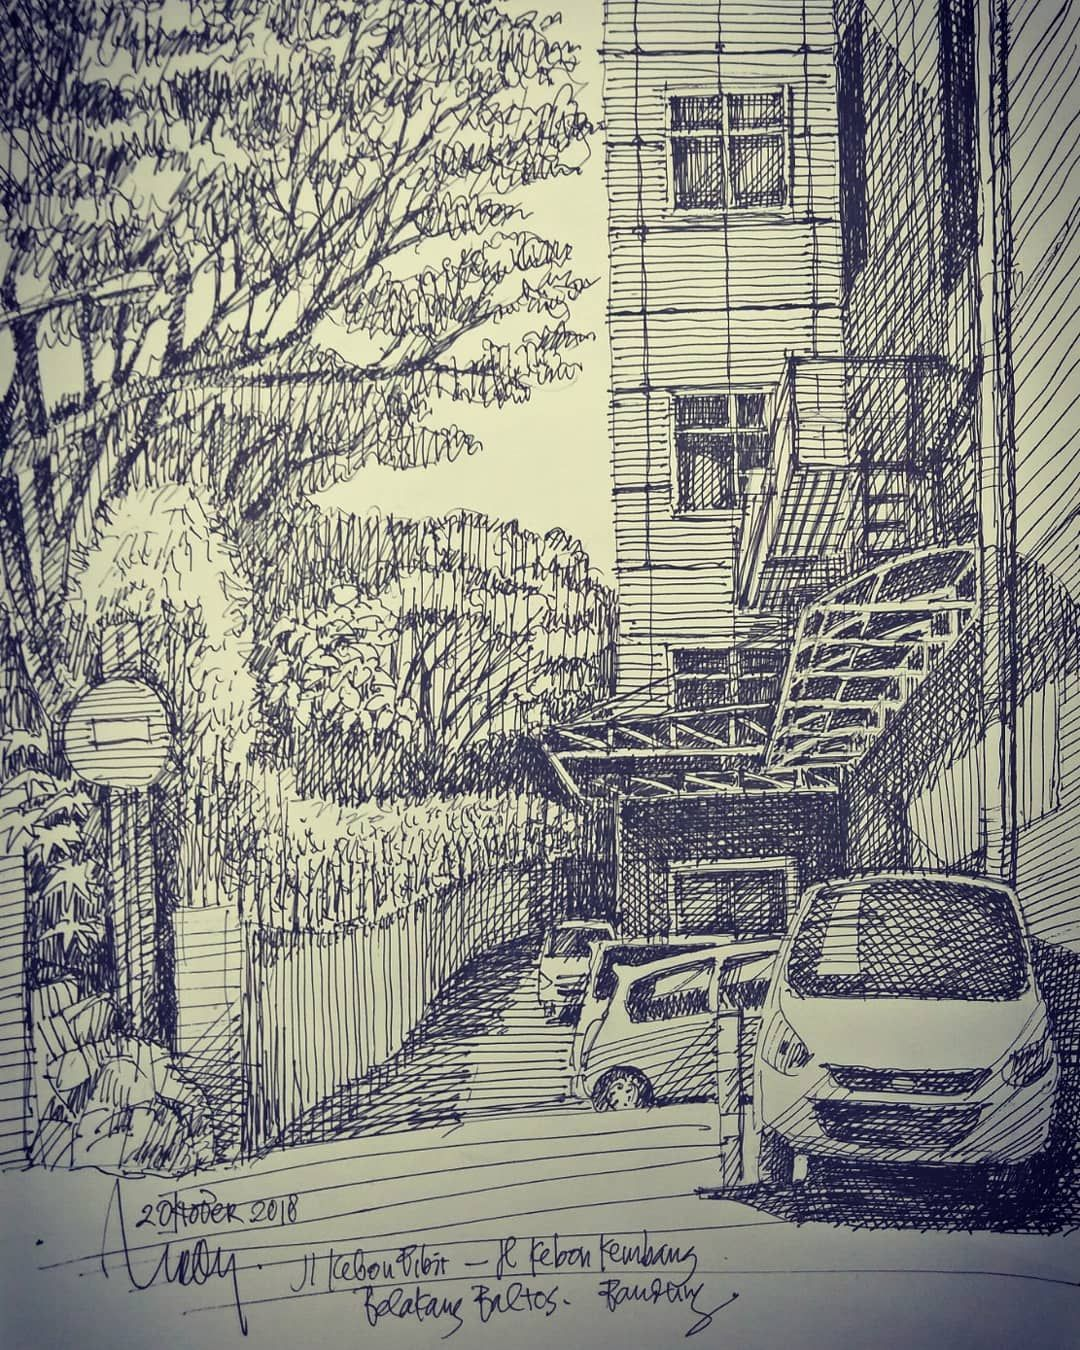 Inktober2 Jalan Penghubung Jl Kebon Kembang Jl Kebon Bibit Di Kolong Baltos Pasopati Bandungjuara Inktober Inktober2018 In Inktober Instagram Aerial